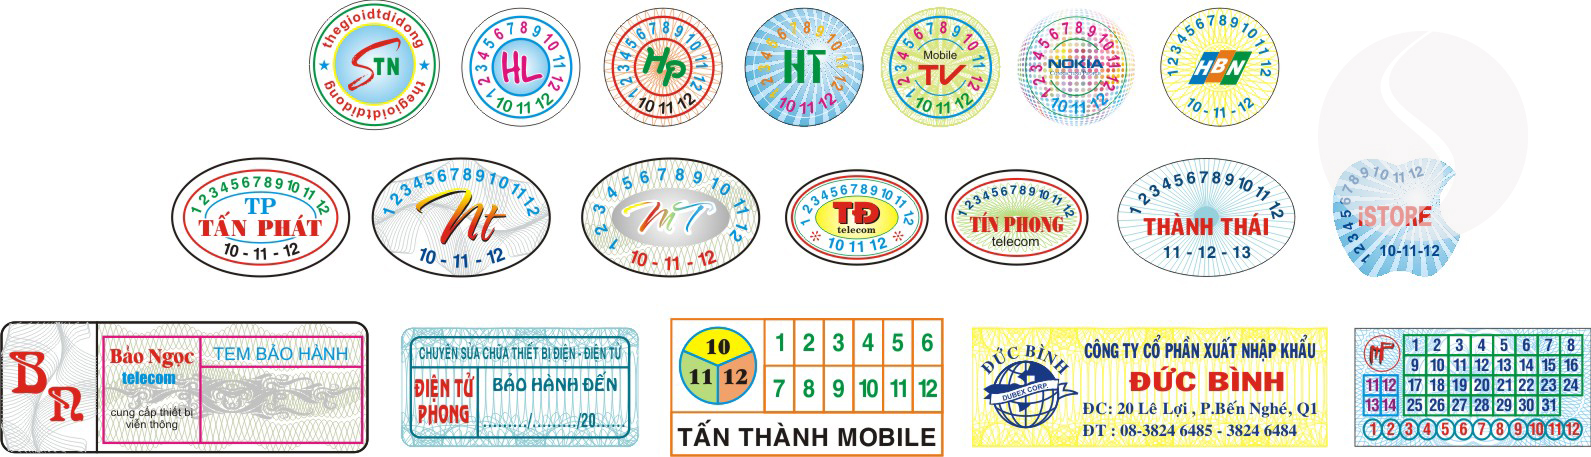 in-tem-bao-hanh-03